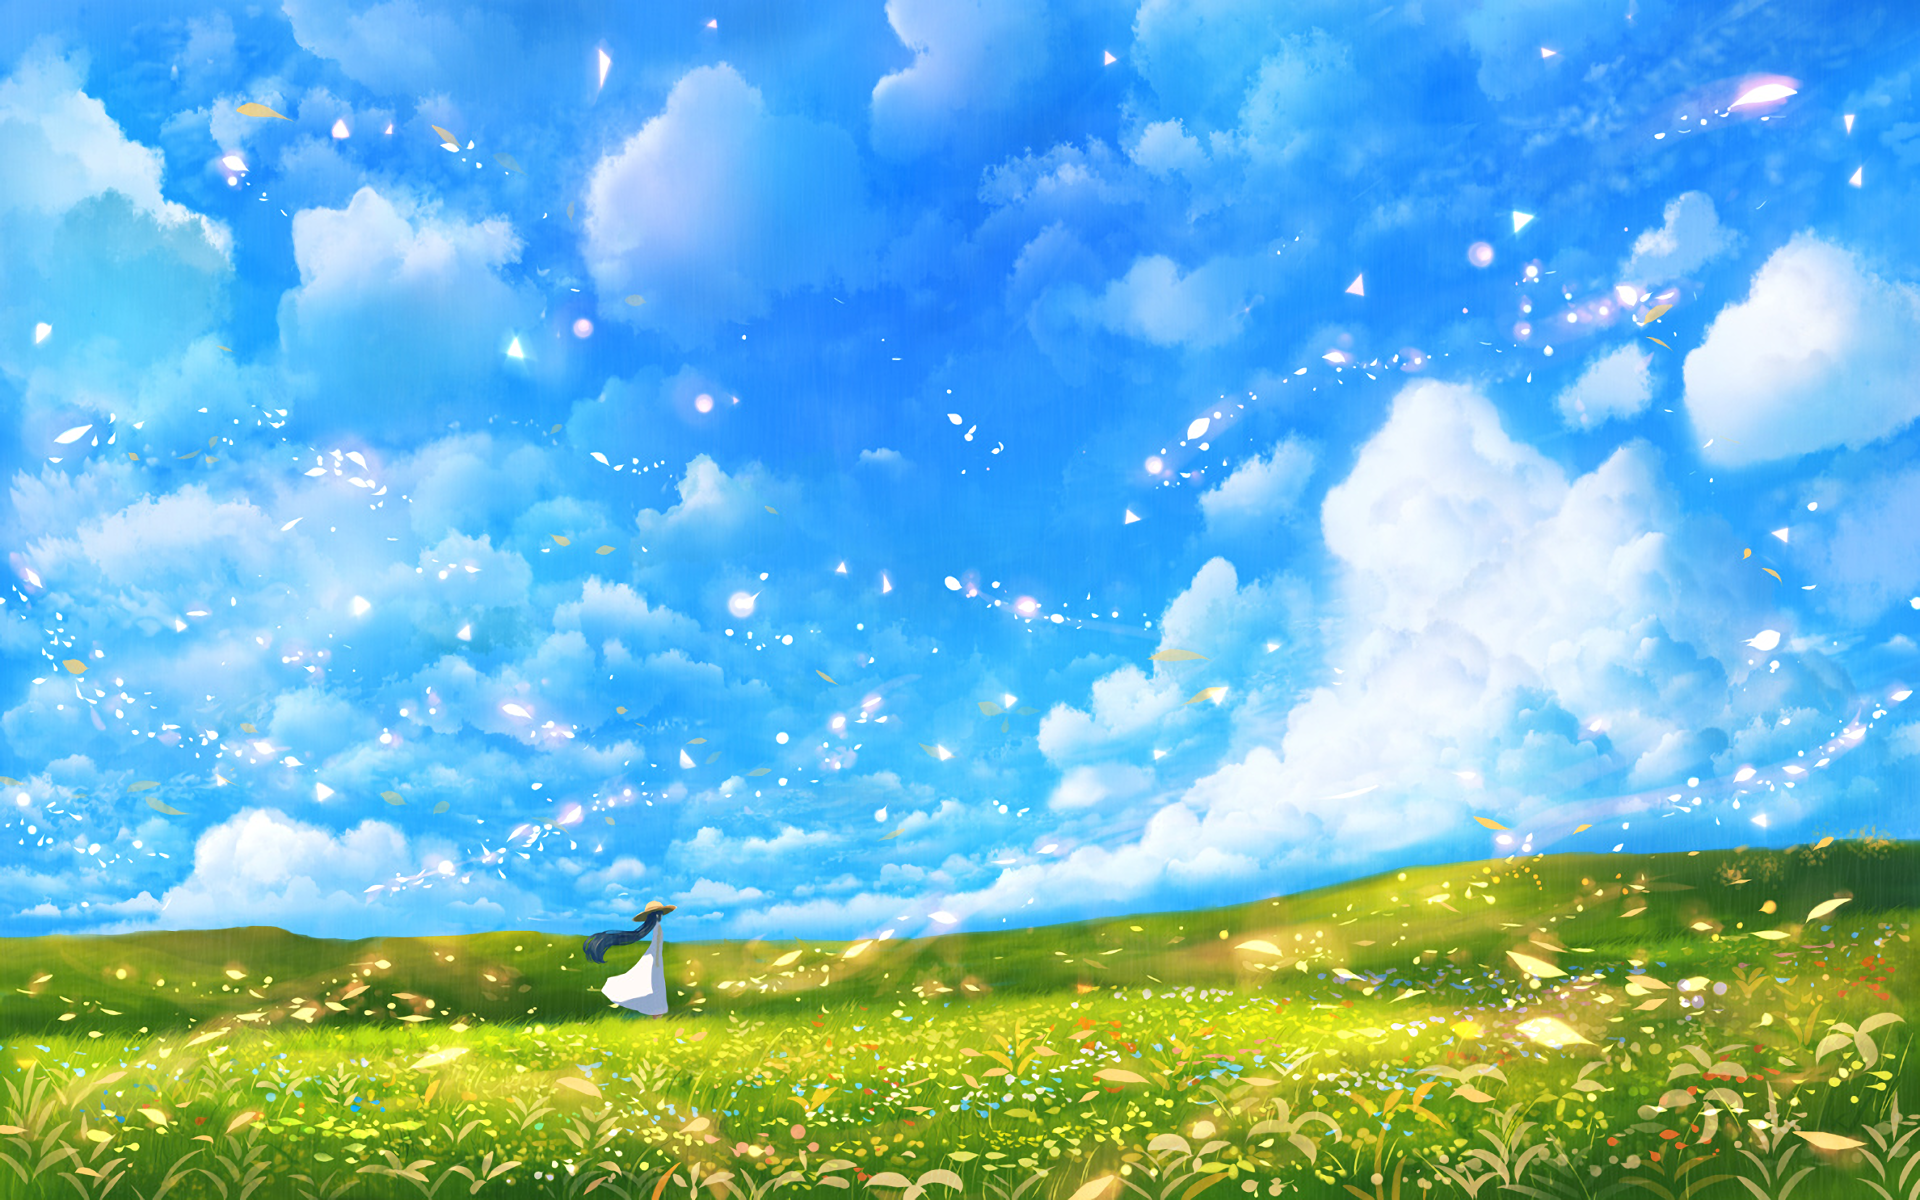 Original Wallpaper Background Image Girl Anime If You Enjoy Pls Follow Me Thanks 3 Anime Scenery Sky Anime Fantasy Landscape